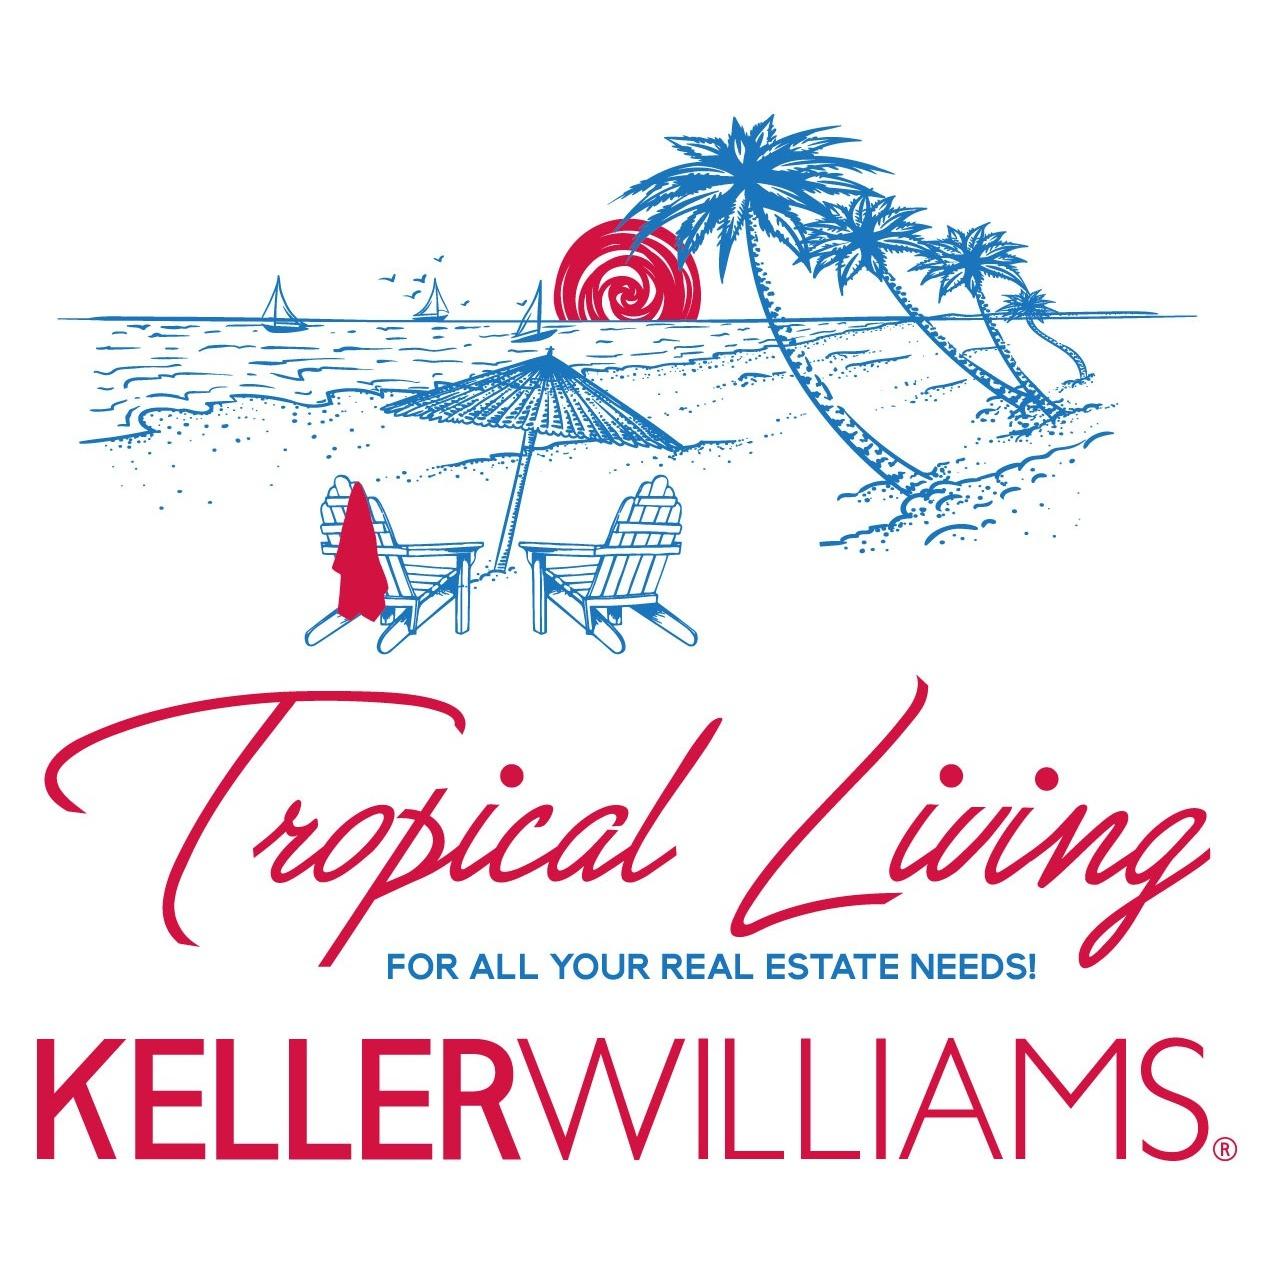 Tropical Living of Keller Williams Realty